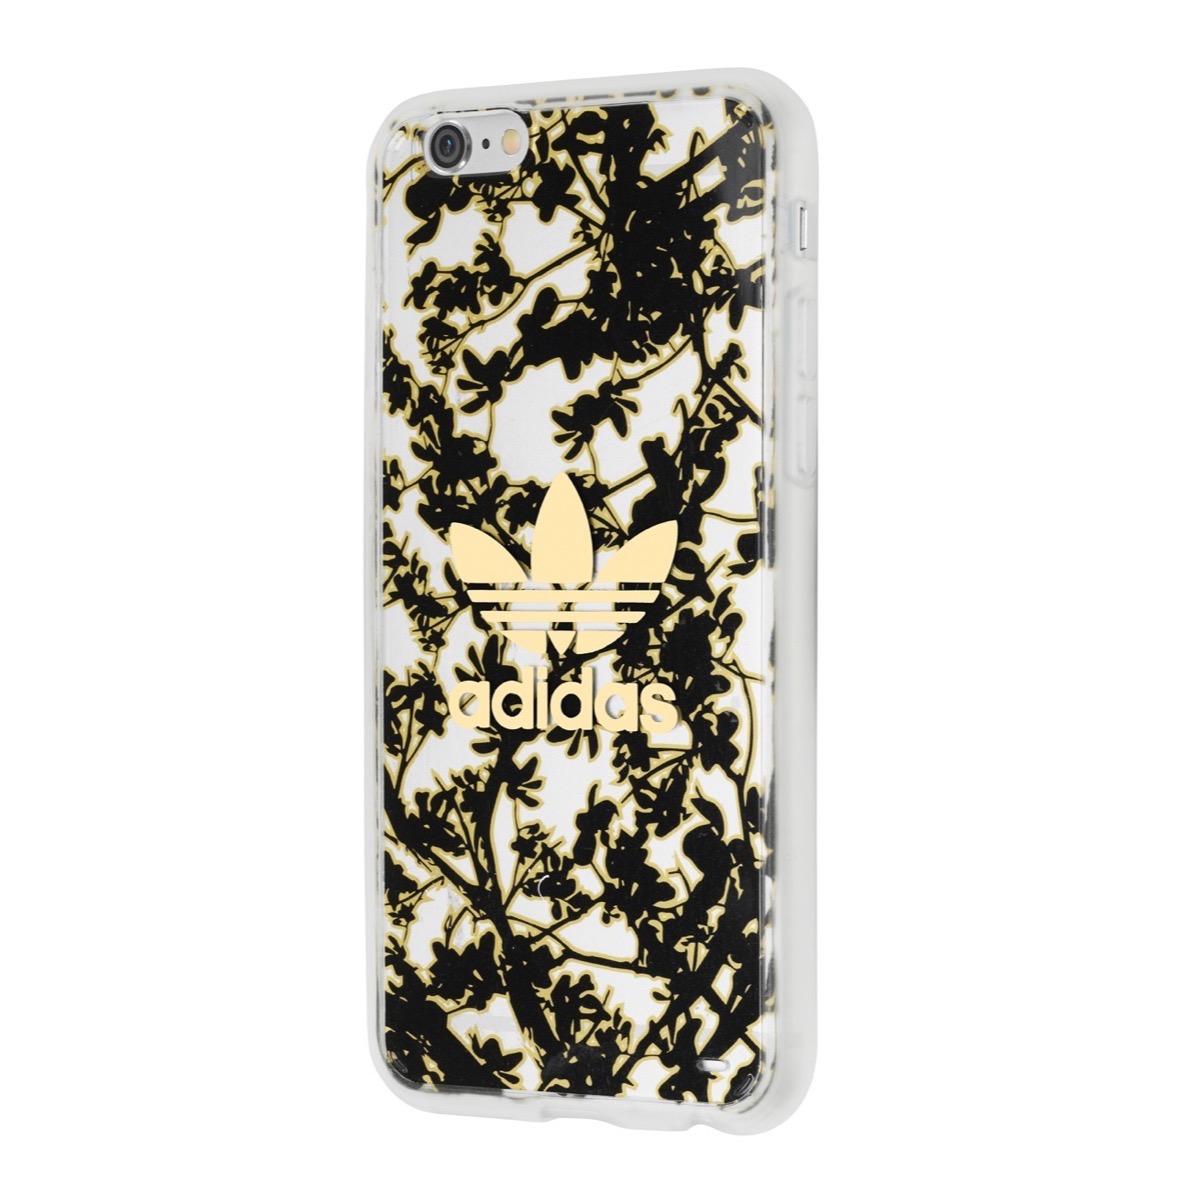 ca62041f26 【取扱終了製品】adidas Originals Clear Case iPhone 6s Tree